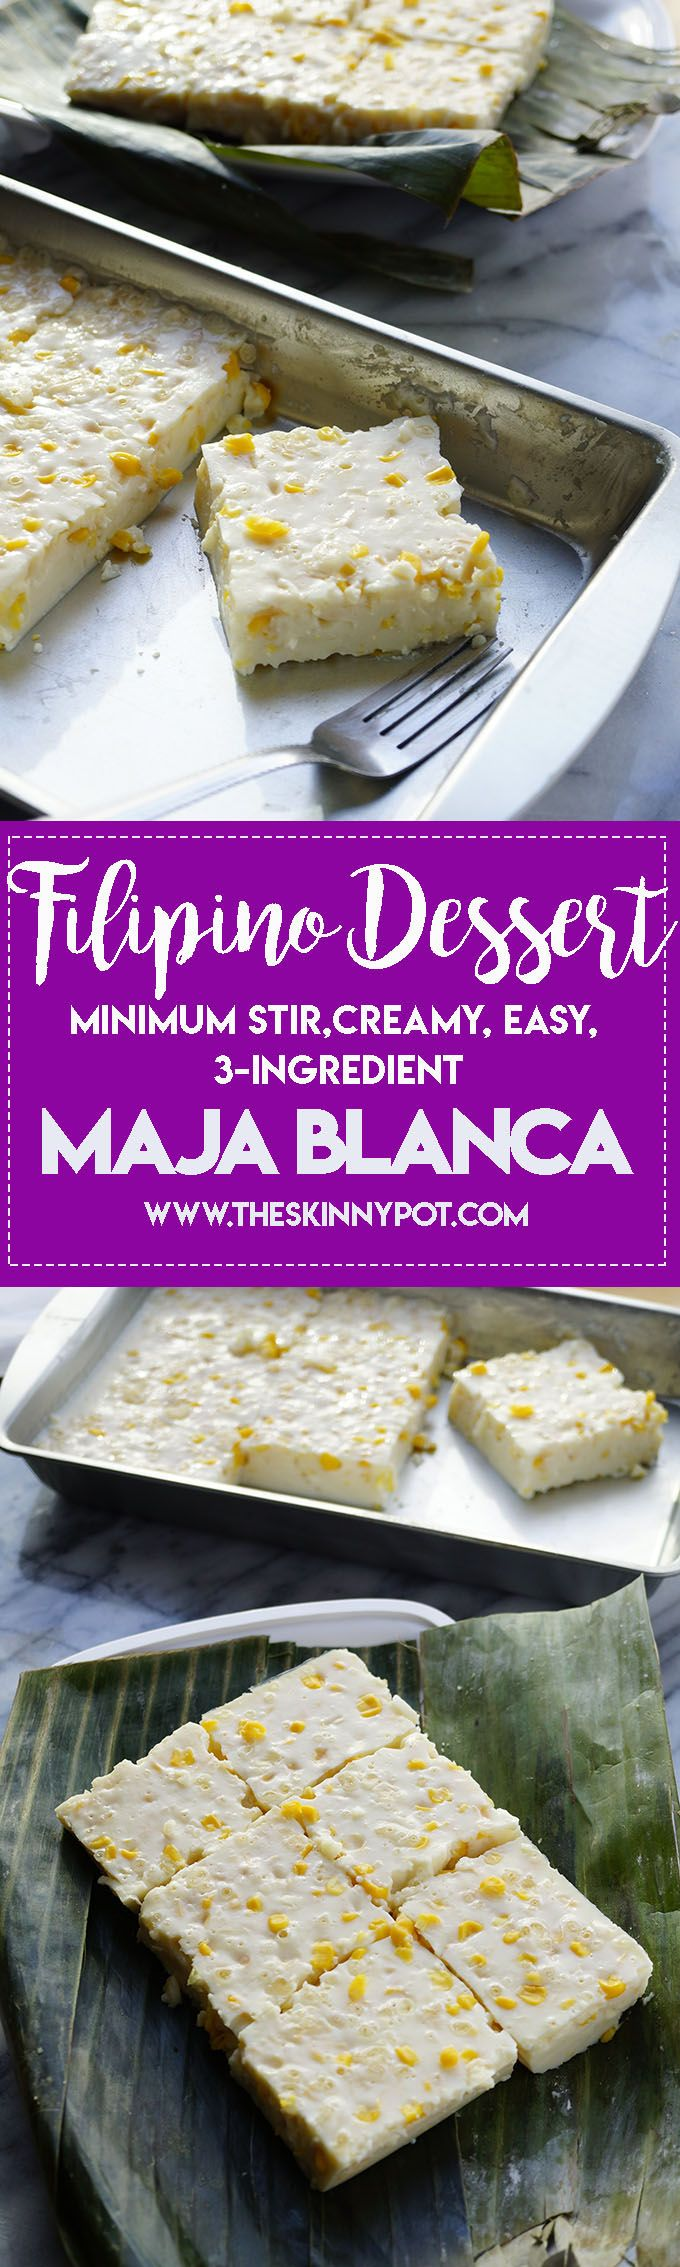 FILIPINO DESSERT:MINIMUM STIR 3 INGREDIENT EASY MAJA BLANCA